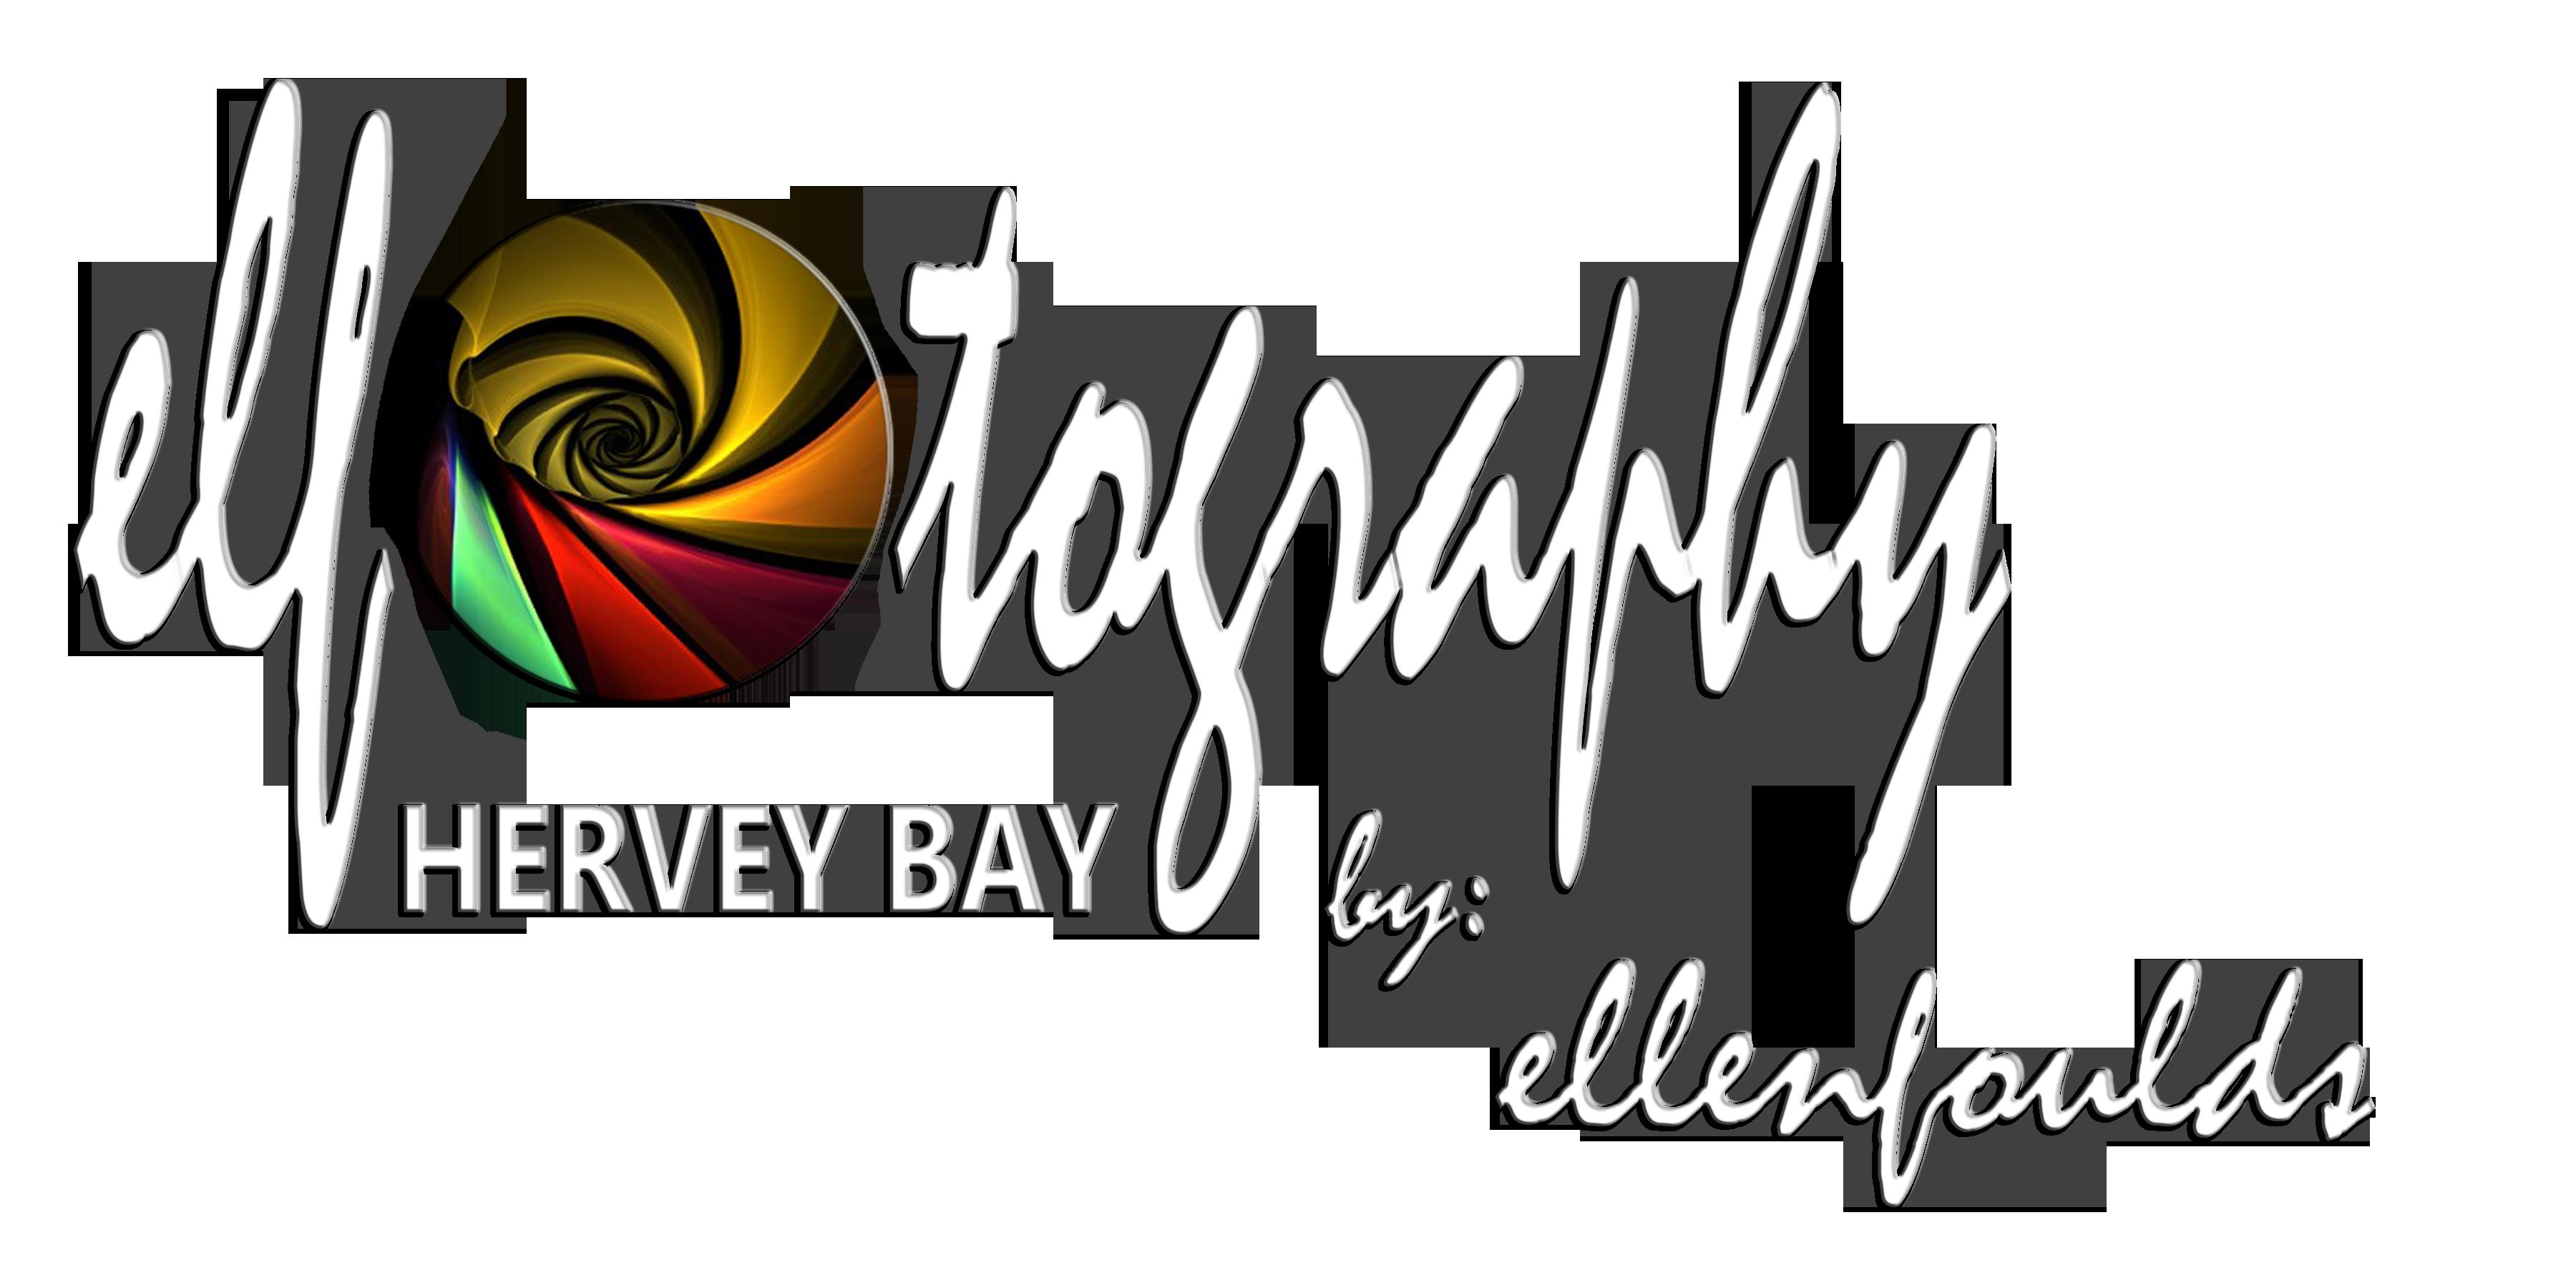 elfotography hervey bay